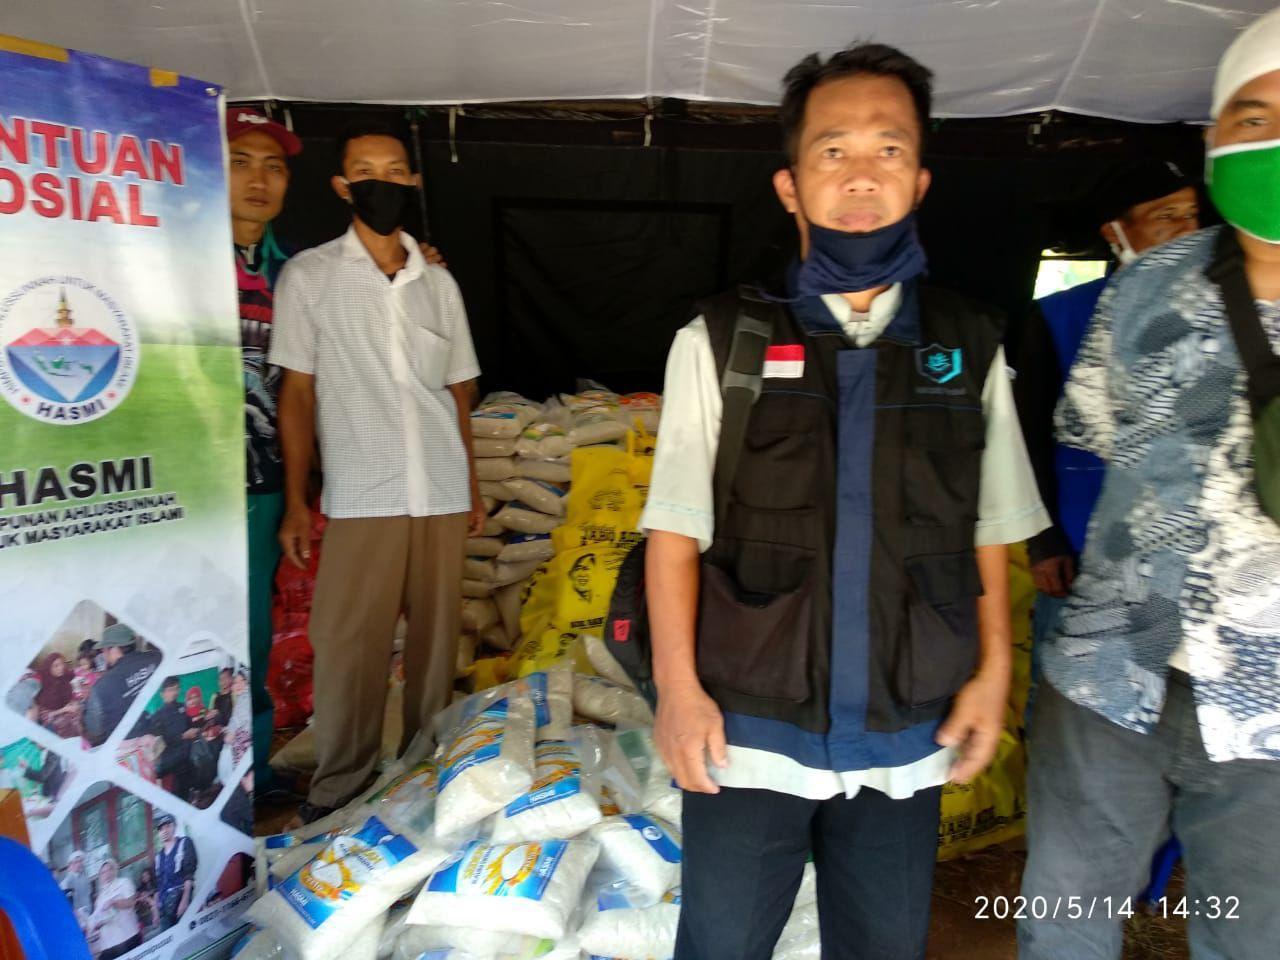 Hasmi Tanggap Bencana Banjir Longsor Lewisadeng Bogor